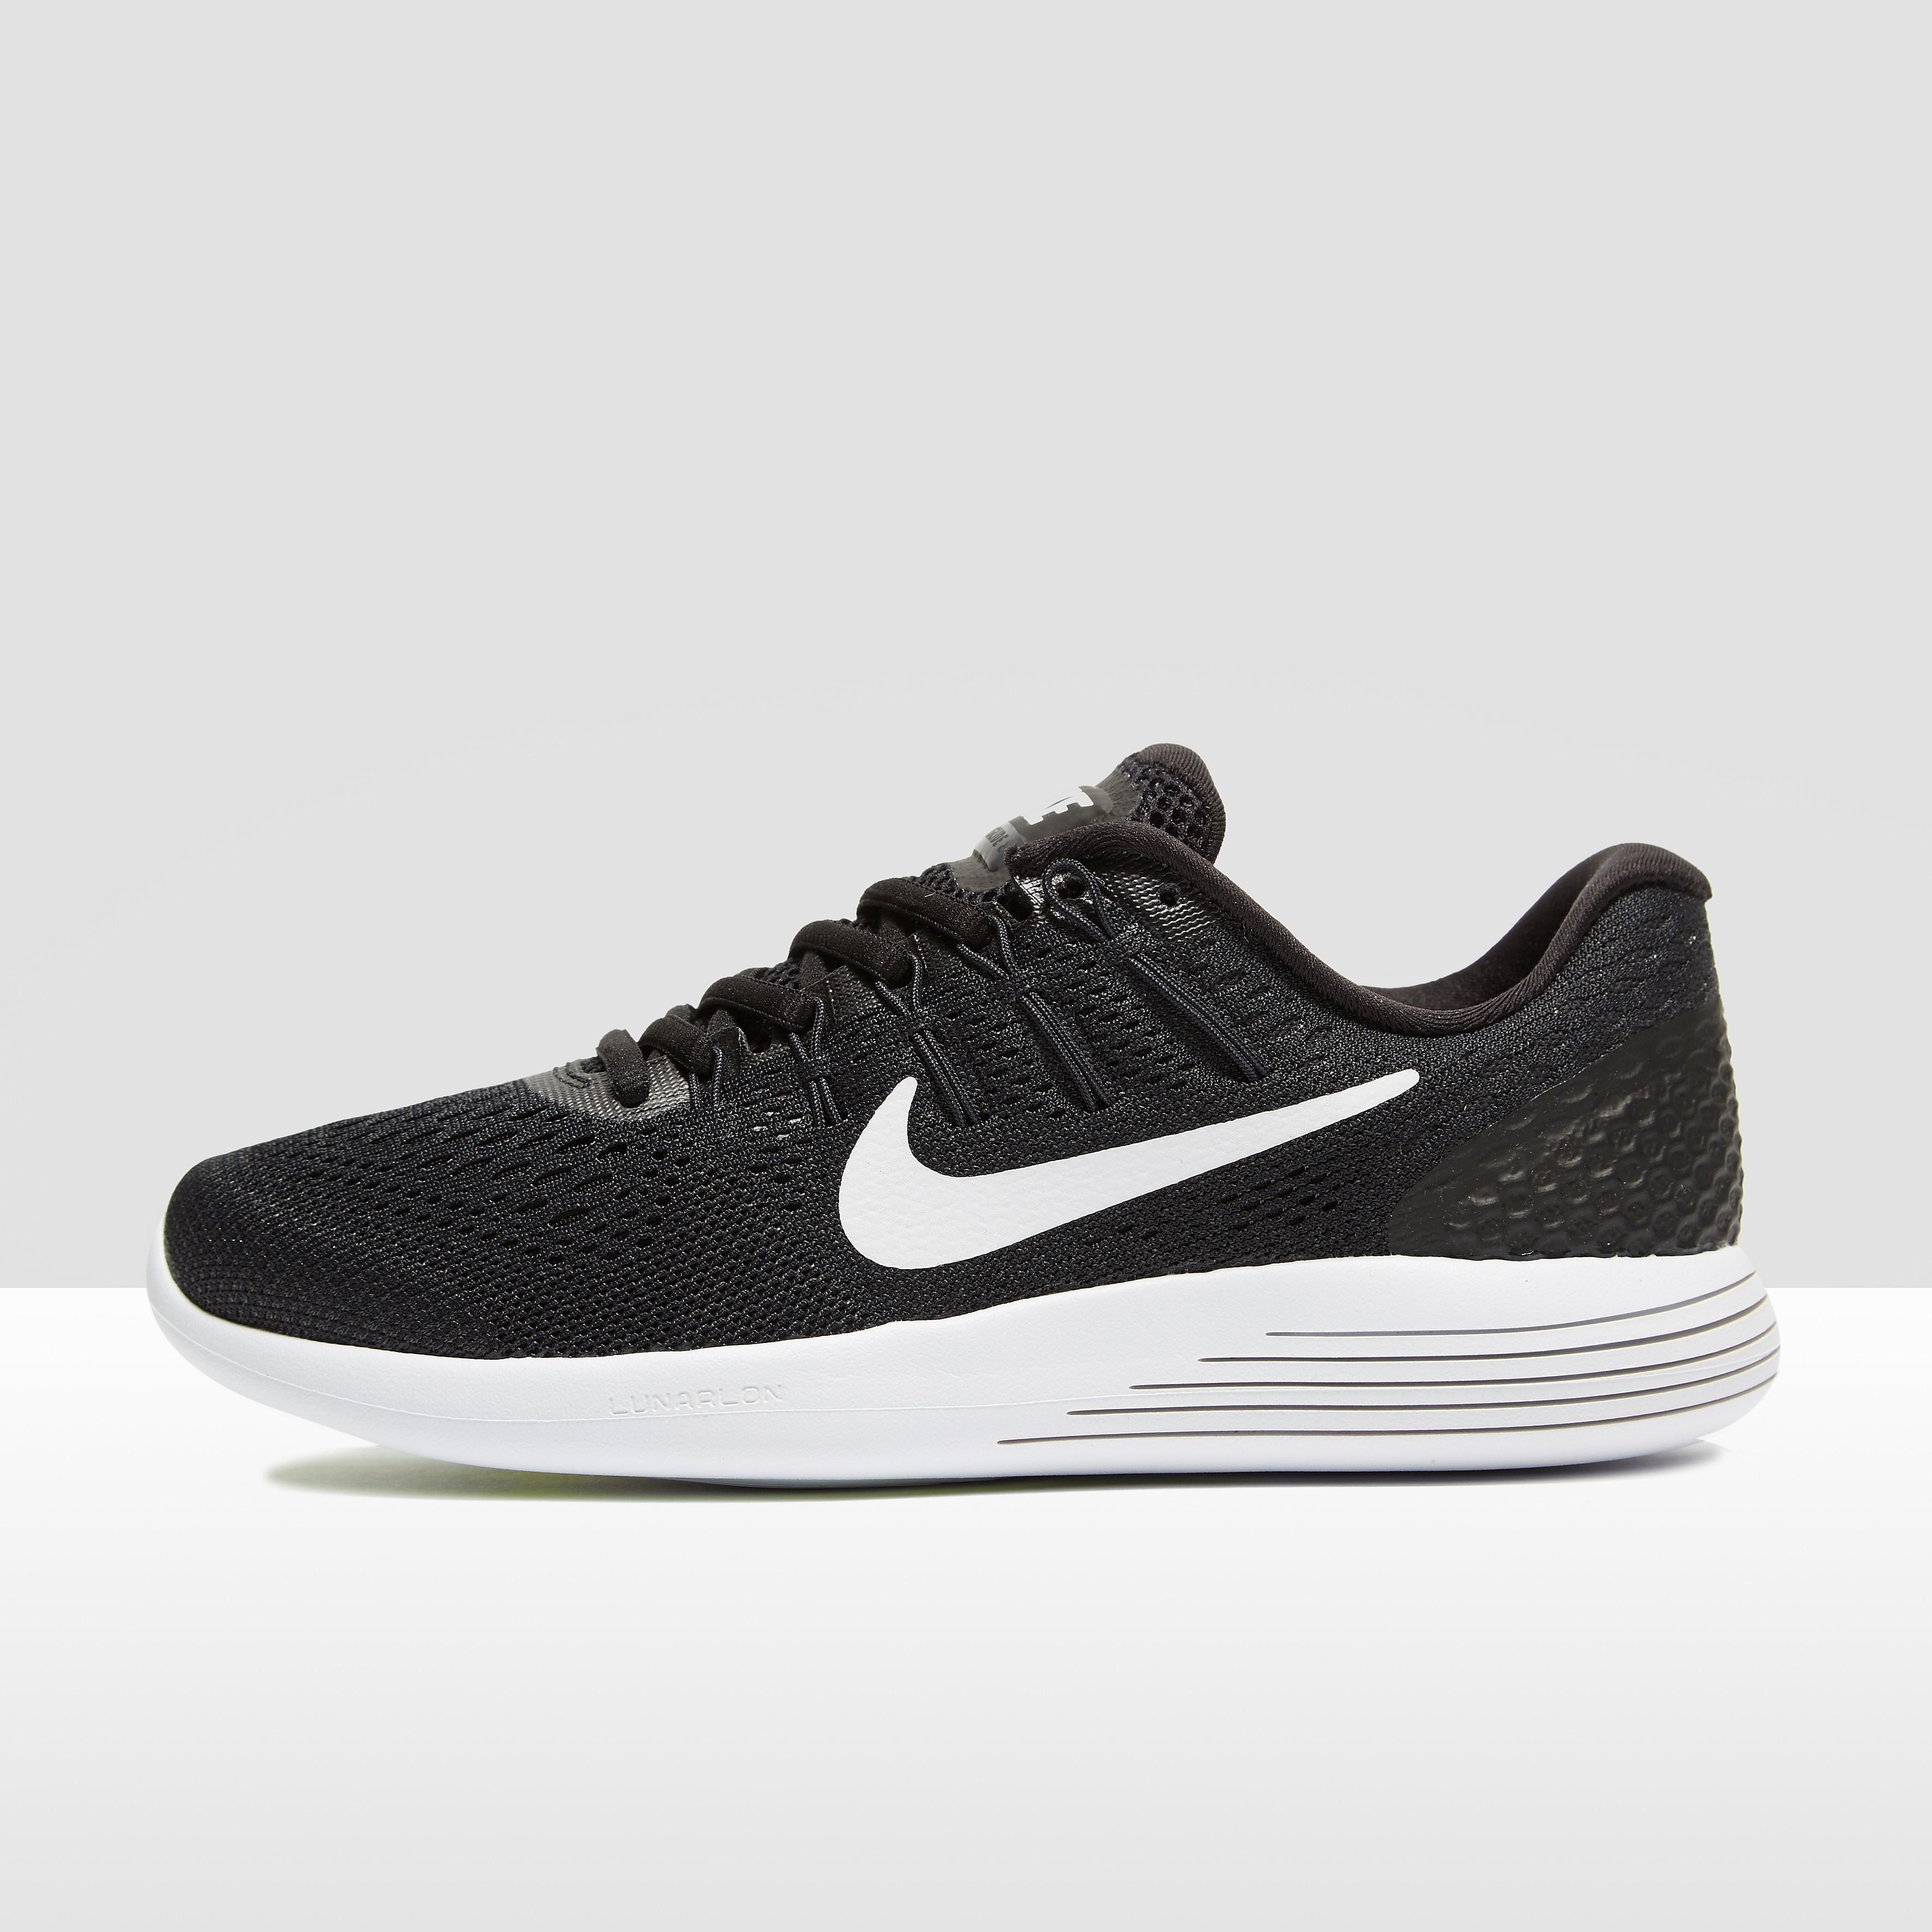 Nike WMNS NIKE LUNARGLIDE 8